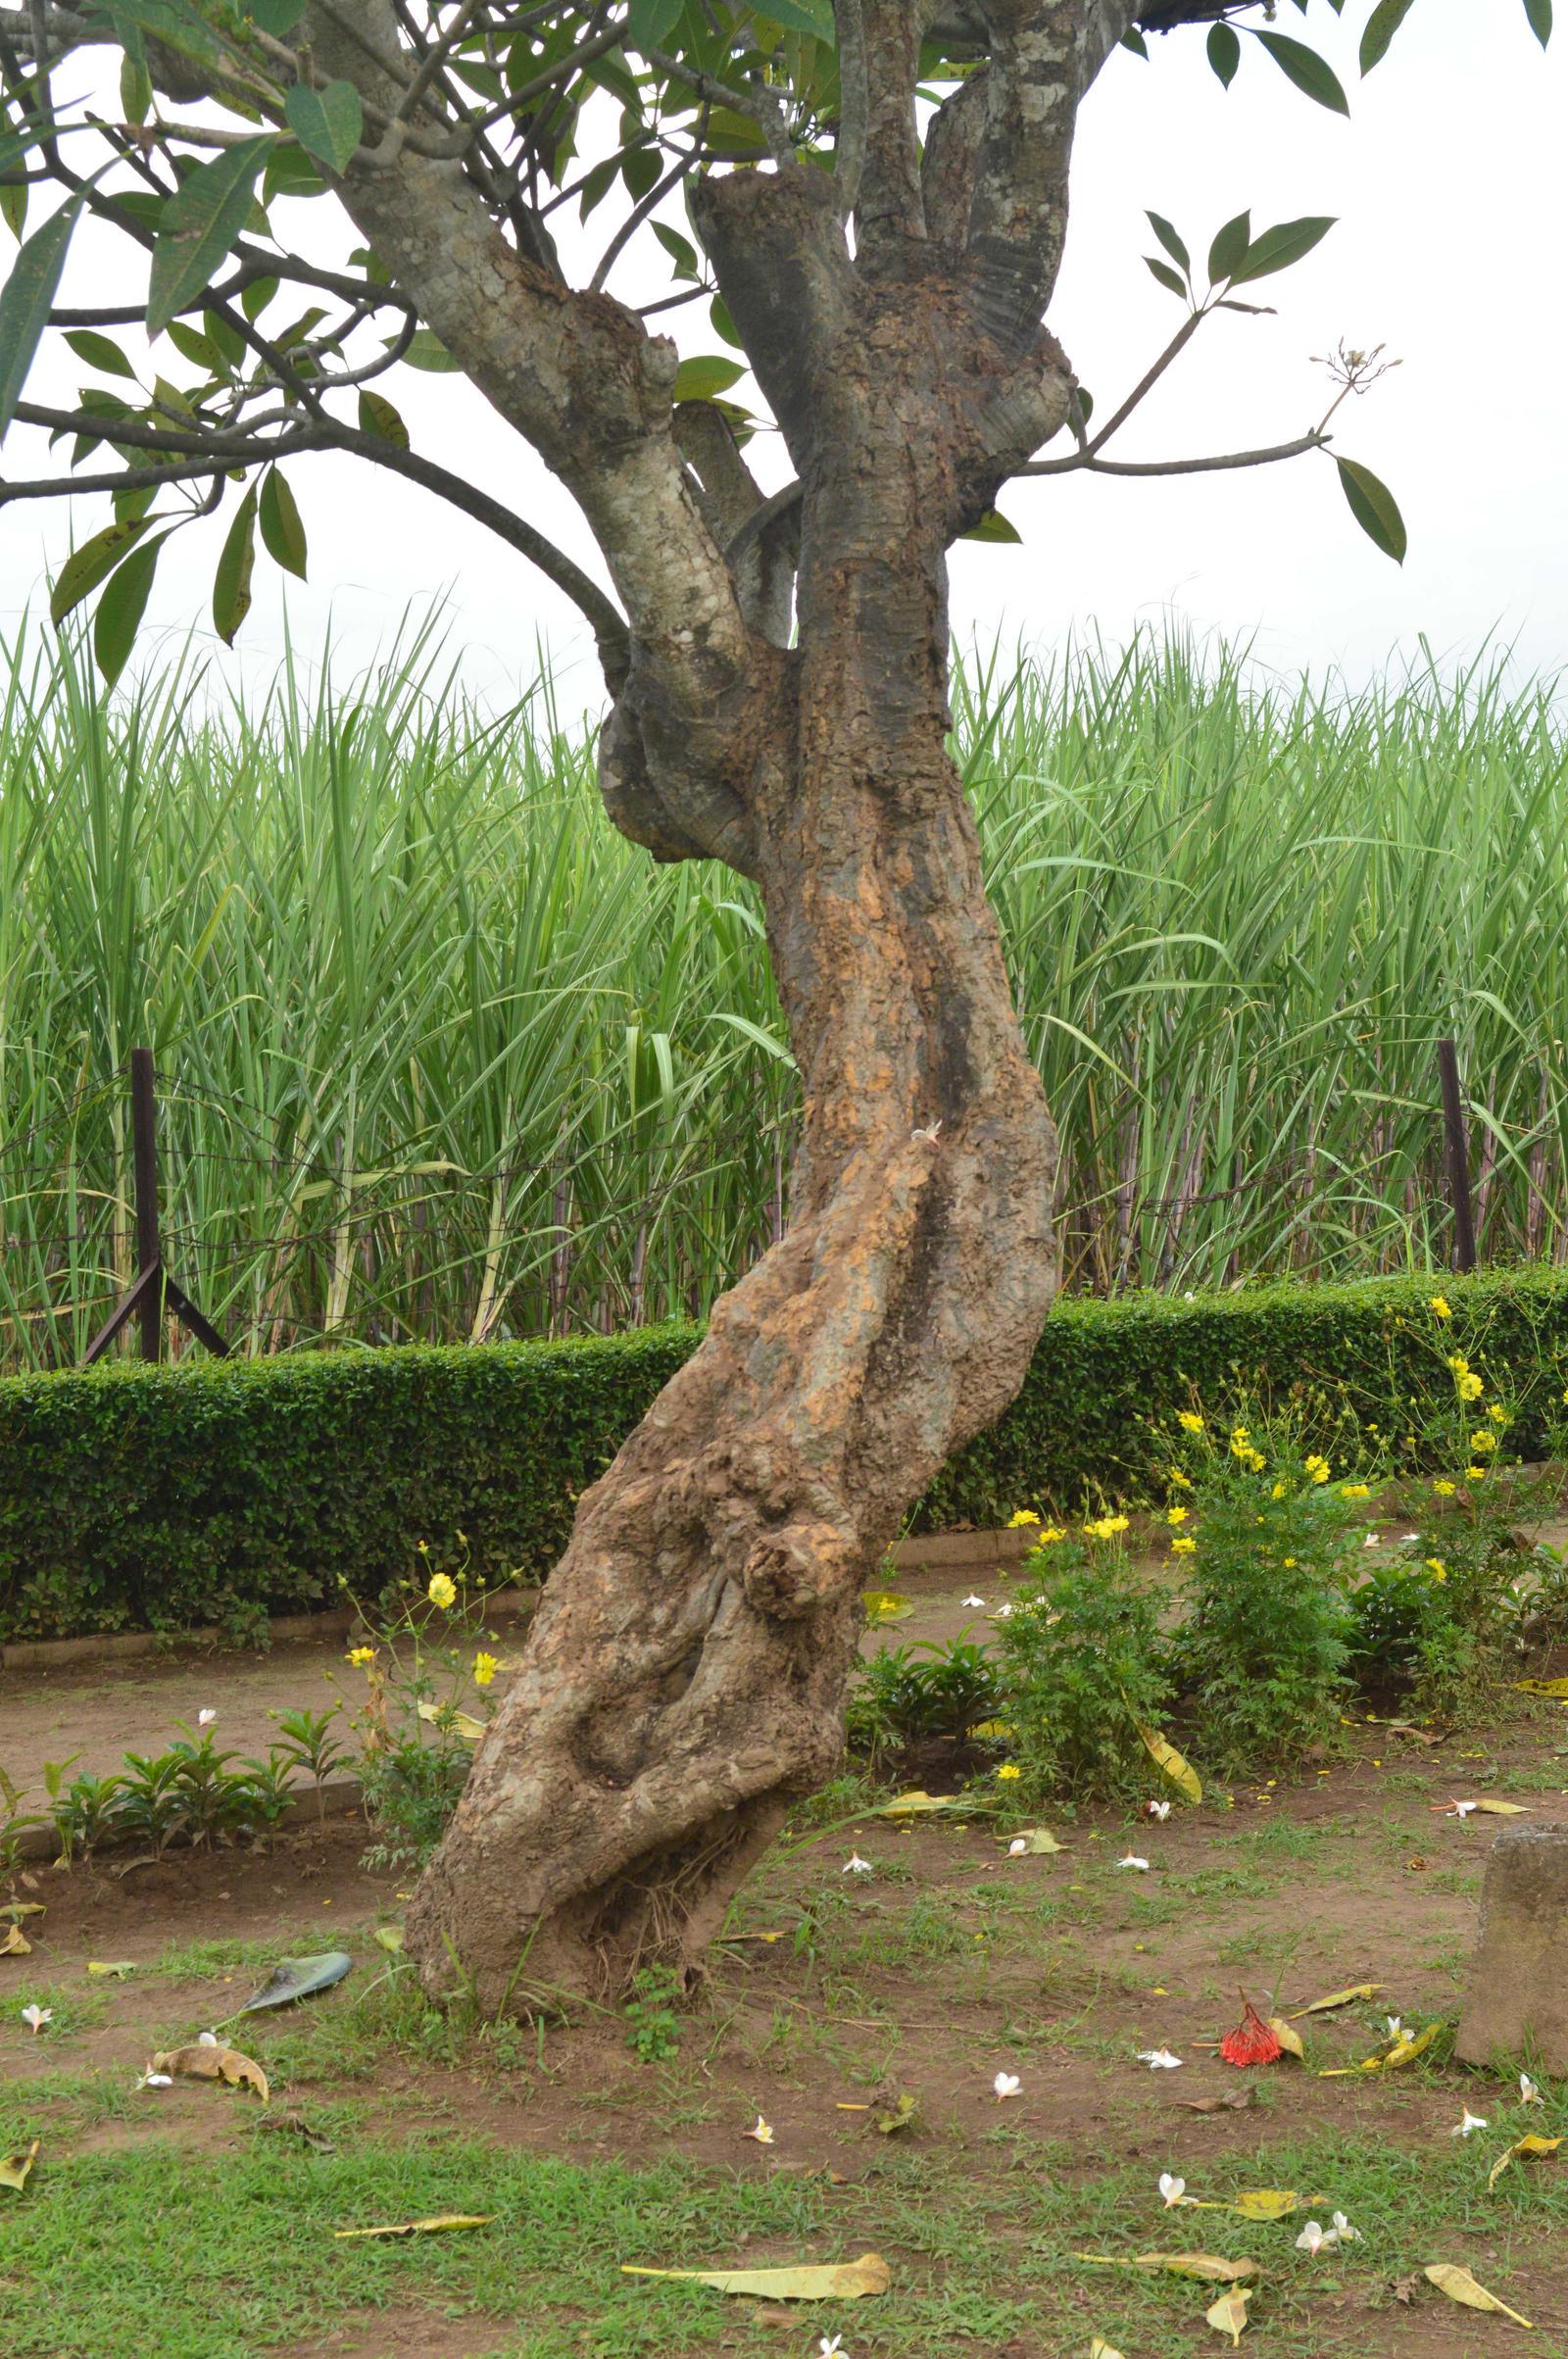 Frangipani Tree1 By Adipancawh